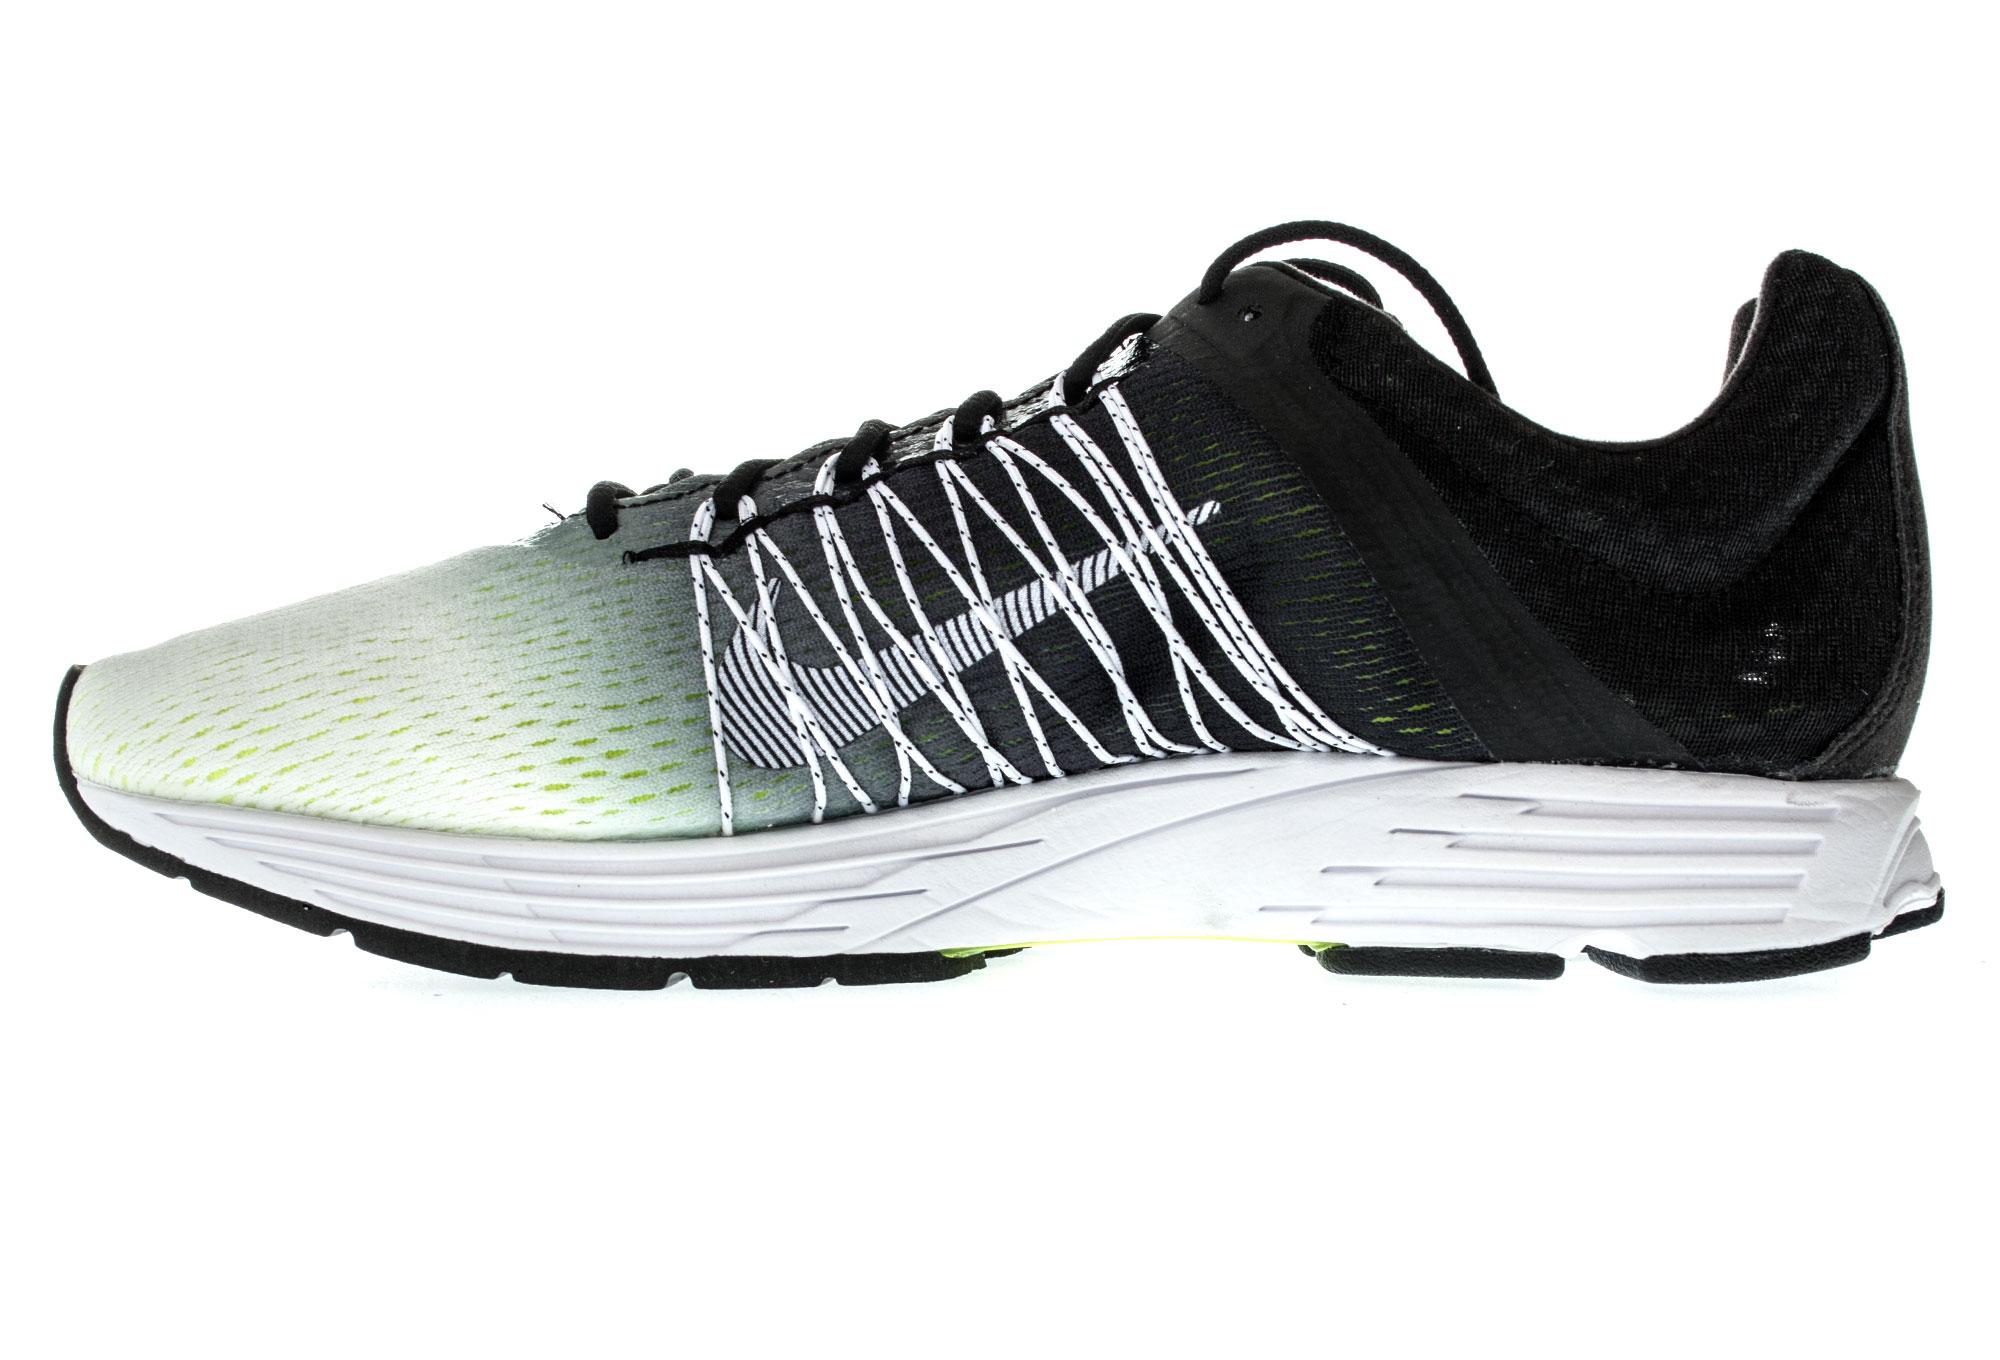 save off bd84a 87f44 Chaussures de Running Nike ZOOM STREAK 5 Blanc